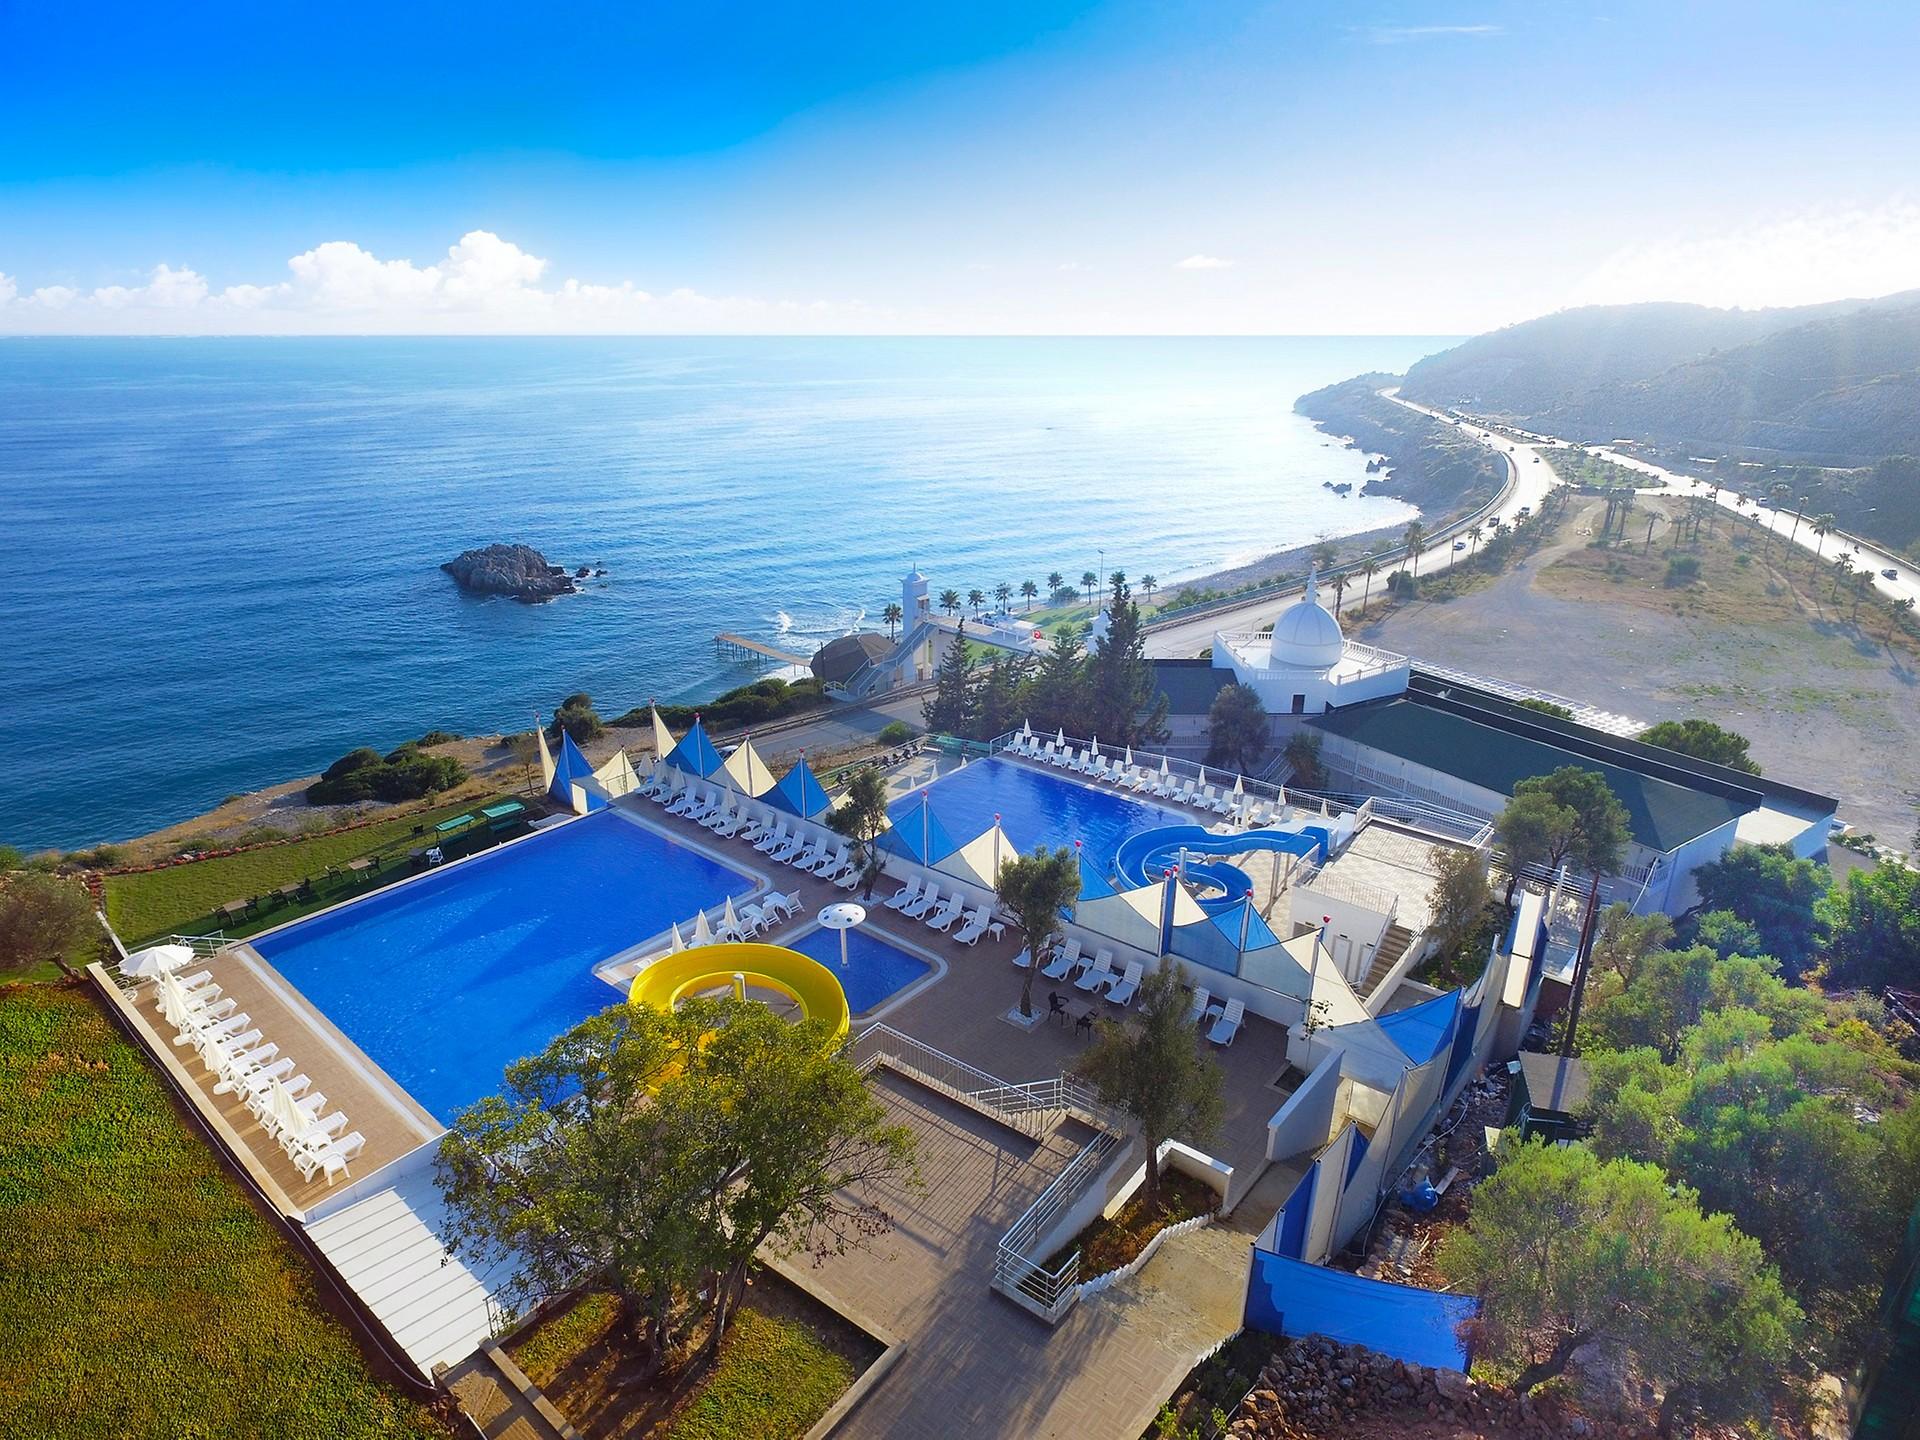 SEA STAR HOTEL261947